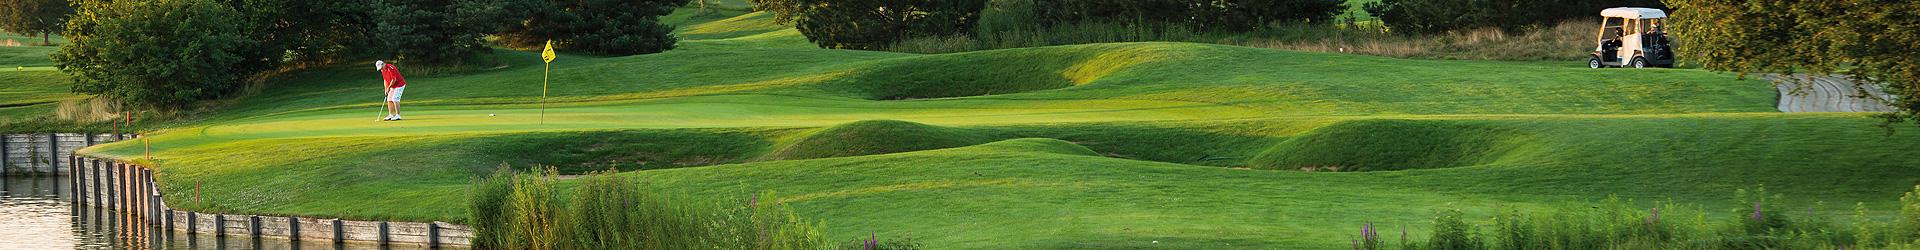 Golf Club St Leon Rot See Hotel Ketsch